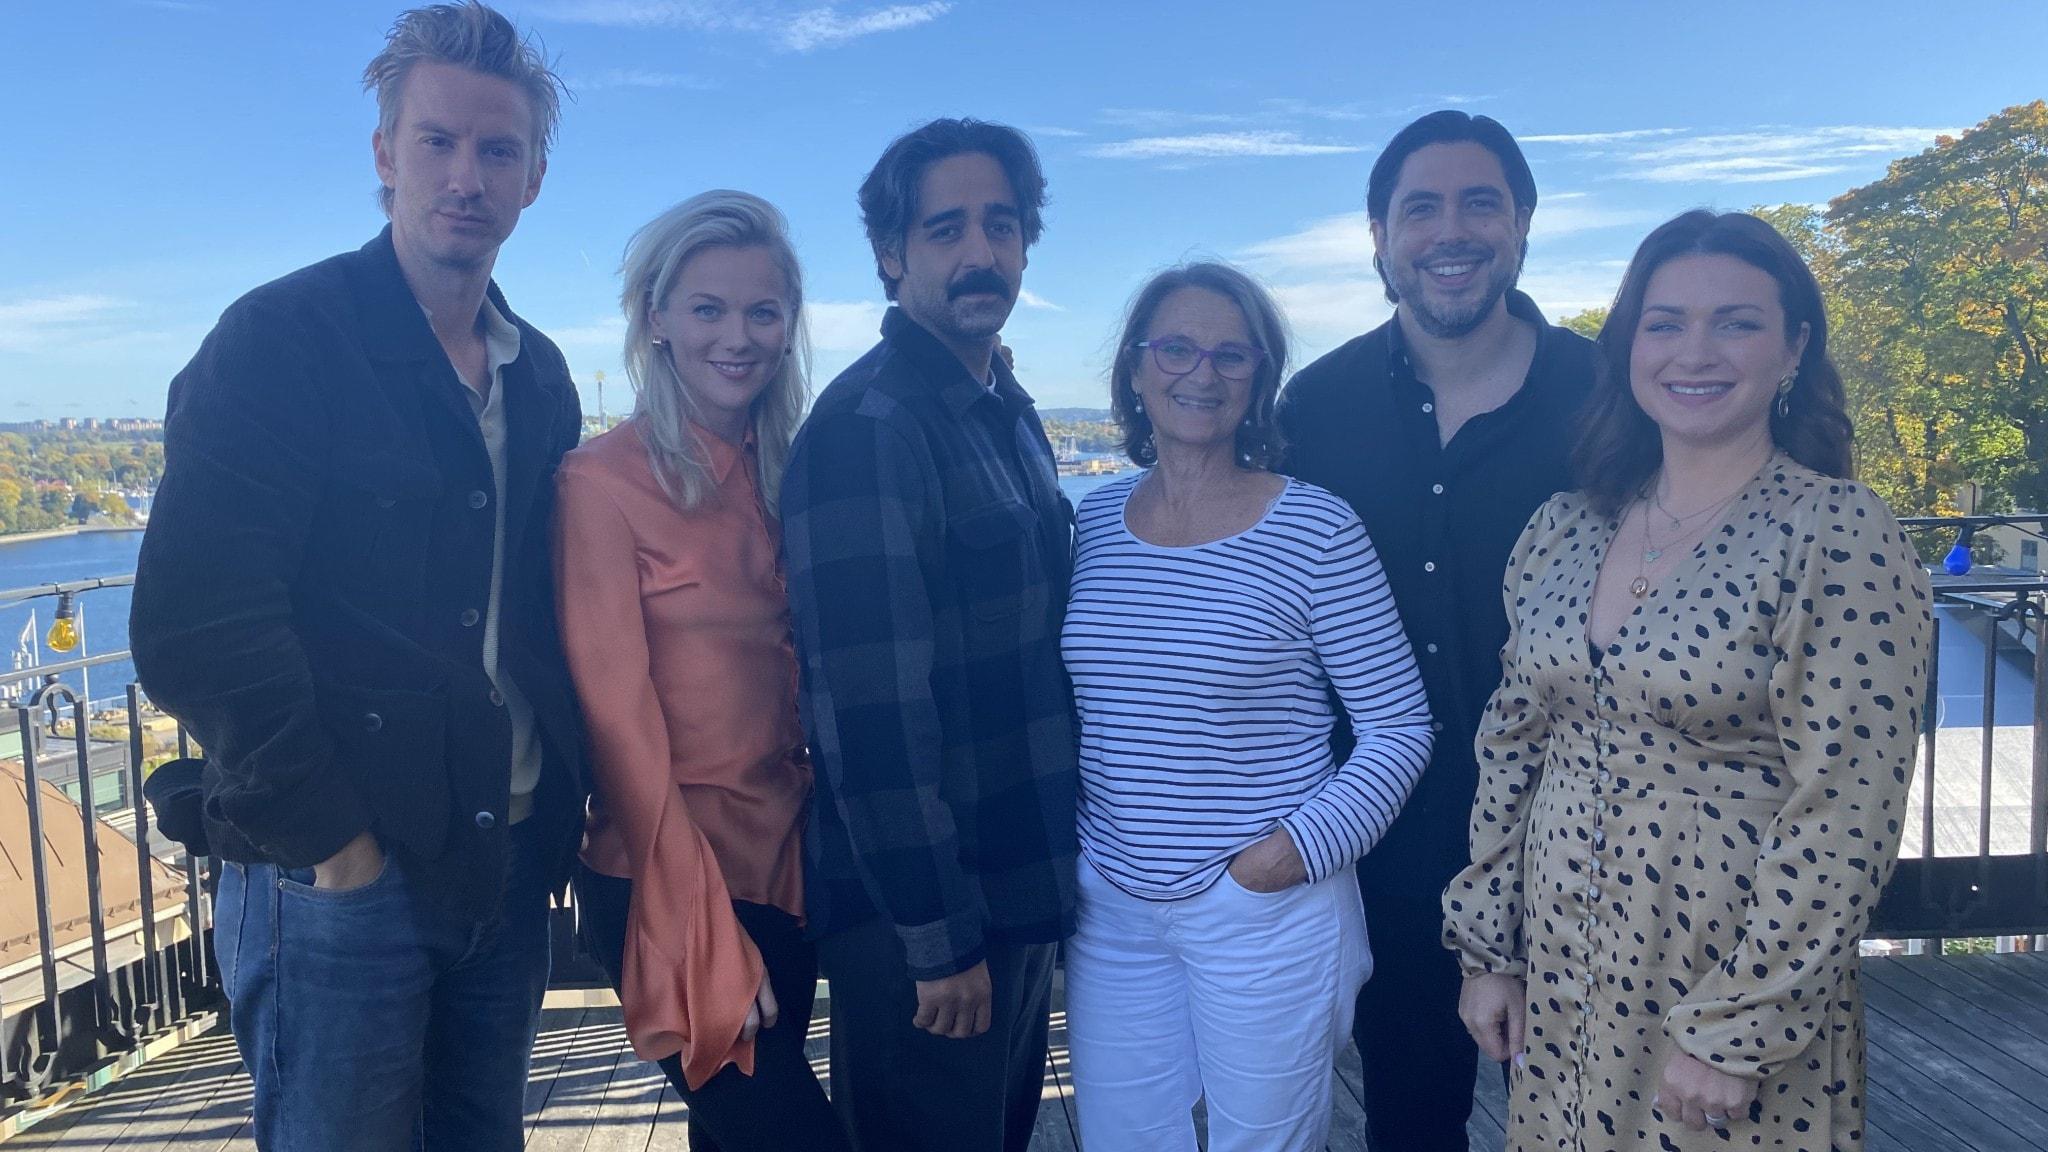 Suedi-gänget: Filip Berg, Agnes Lindström Bolmgren, Kardo Razzazi, Suzanne Reuter, Manuel Concha och Claudia Galli Concha